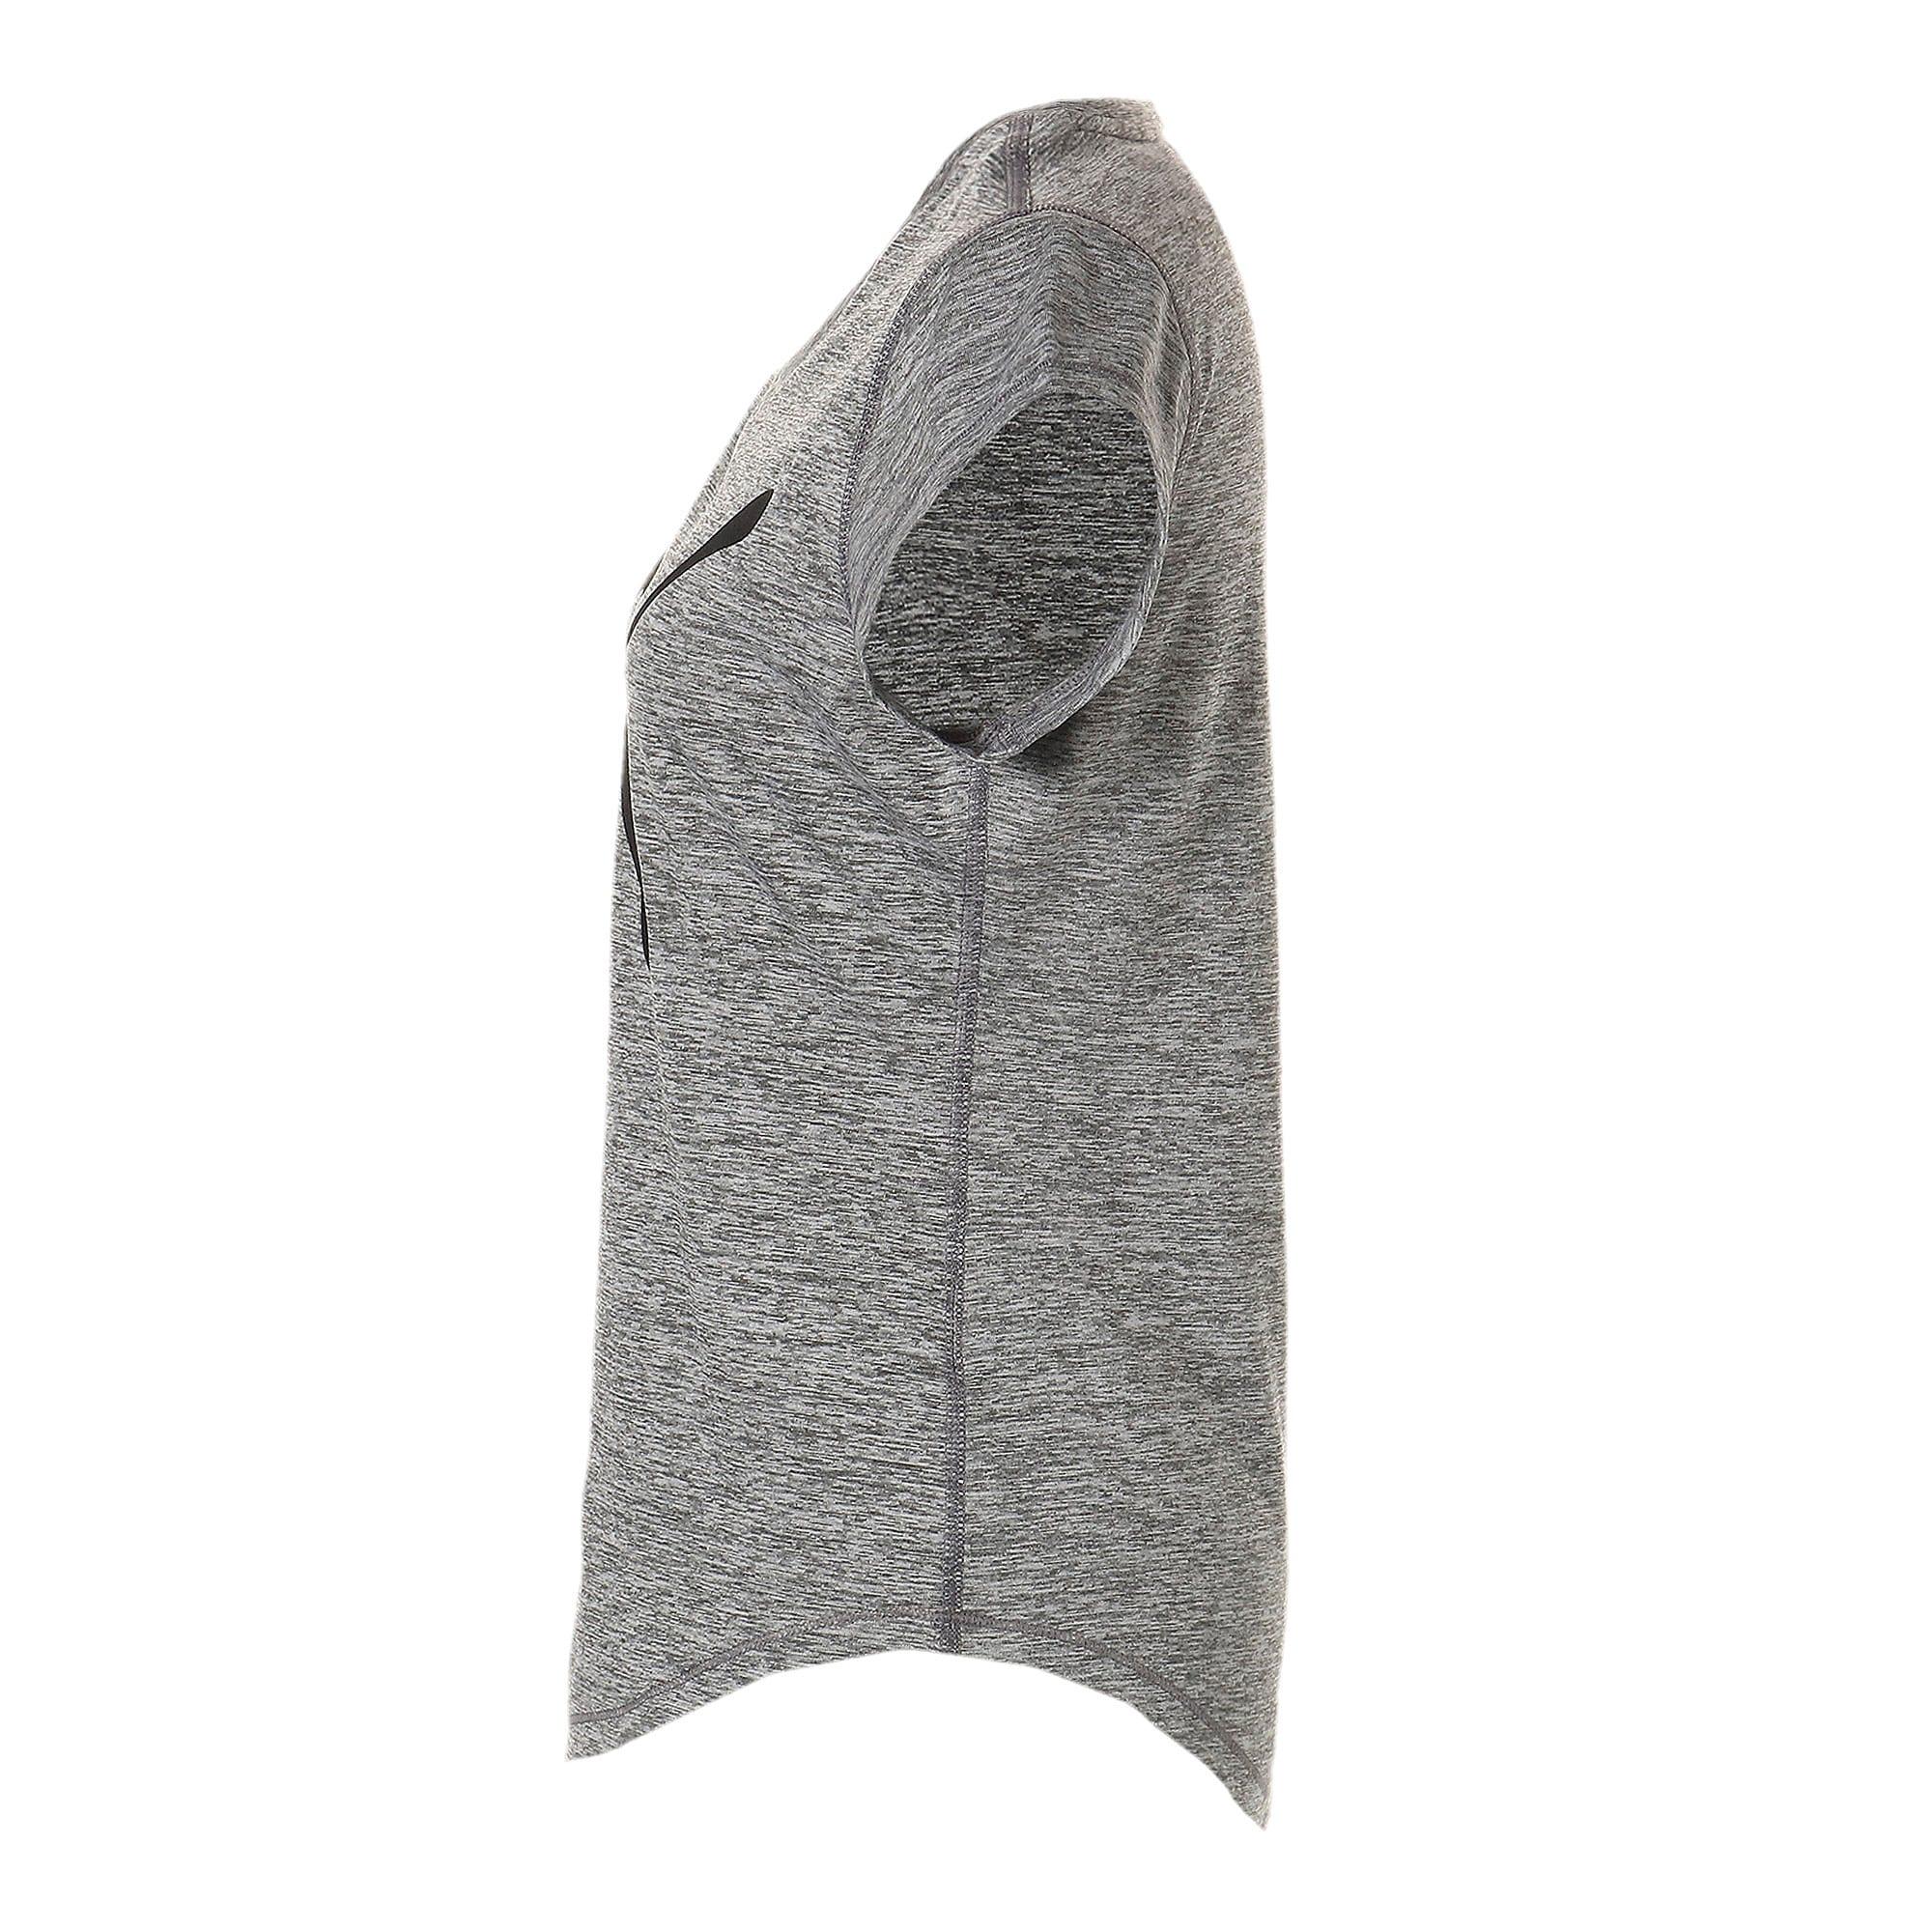 Thumbnail 5 of ヘザー キャット ウィメンズ ランニング Tシャツ 半袖, Medium Gray Heather, medium-JPN